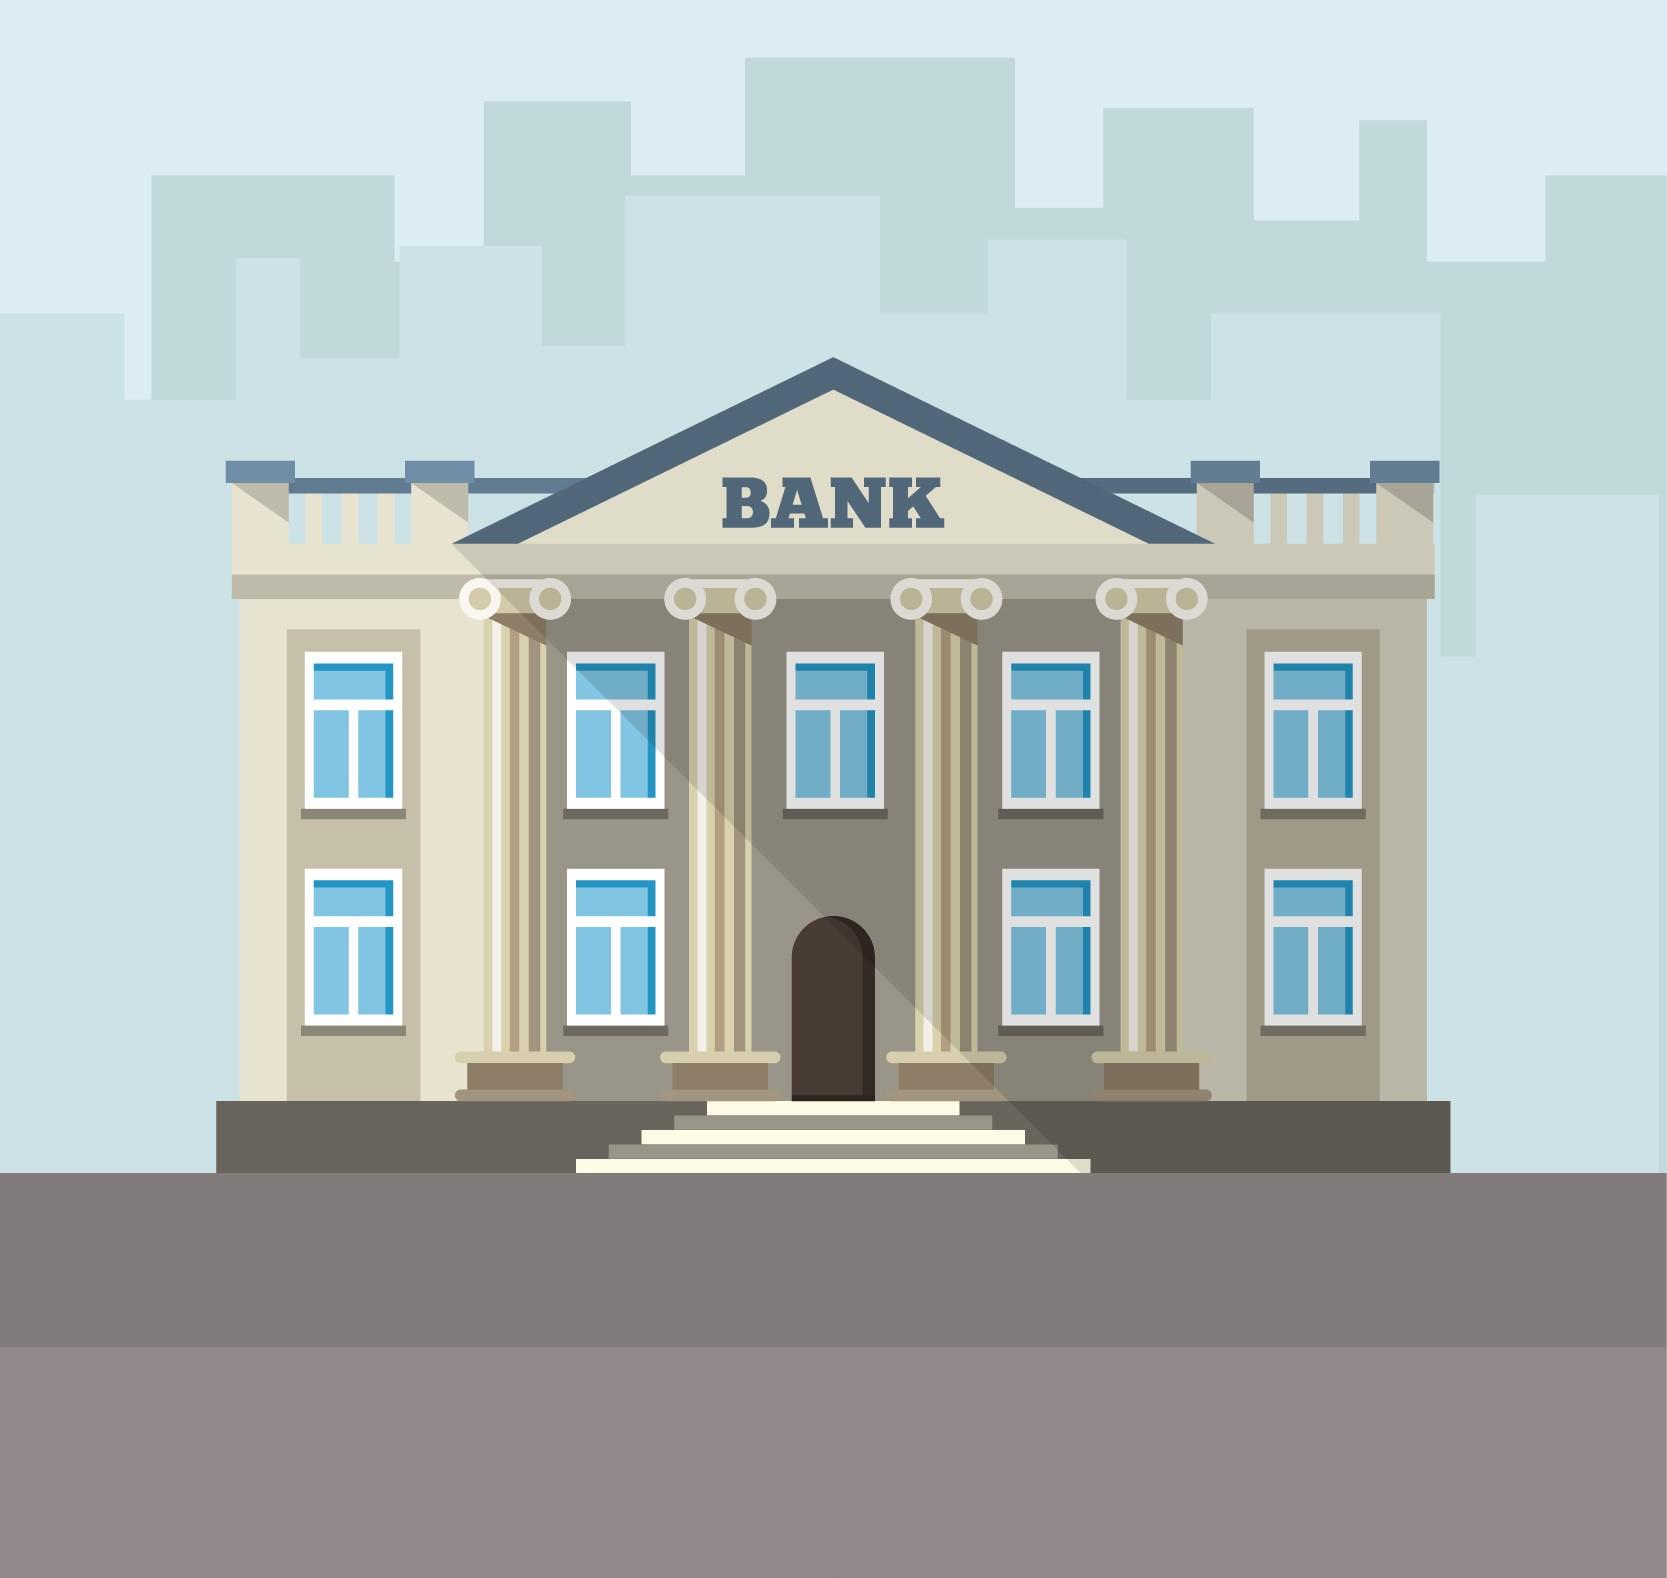 Visa patents digital currency, appears solution targets central banks